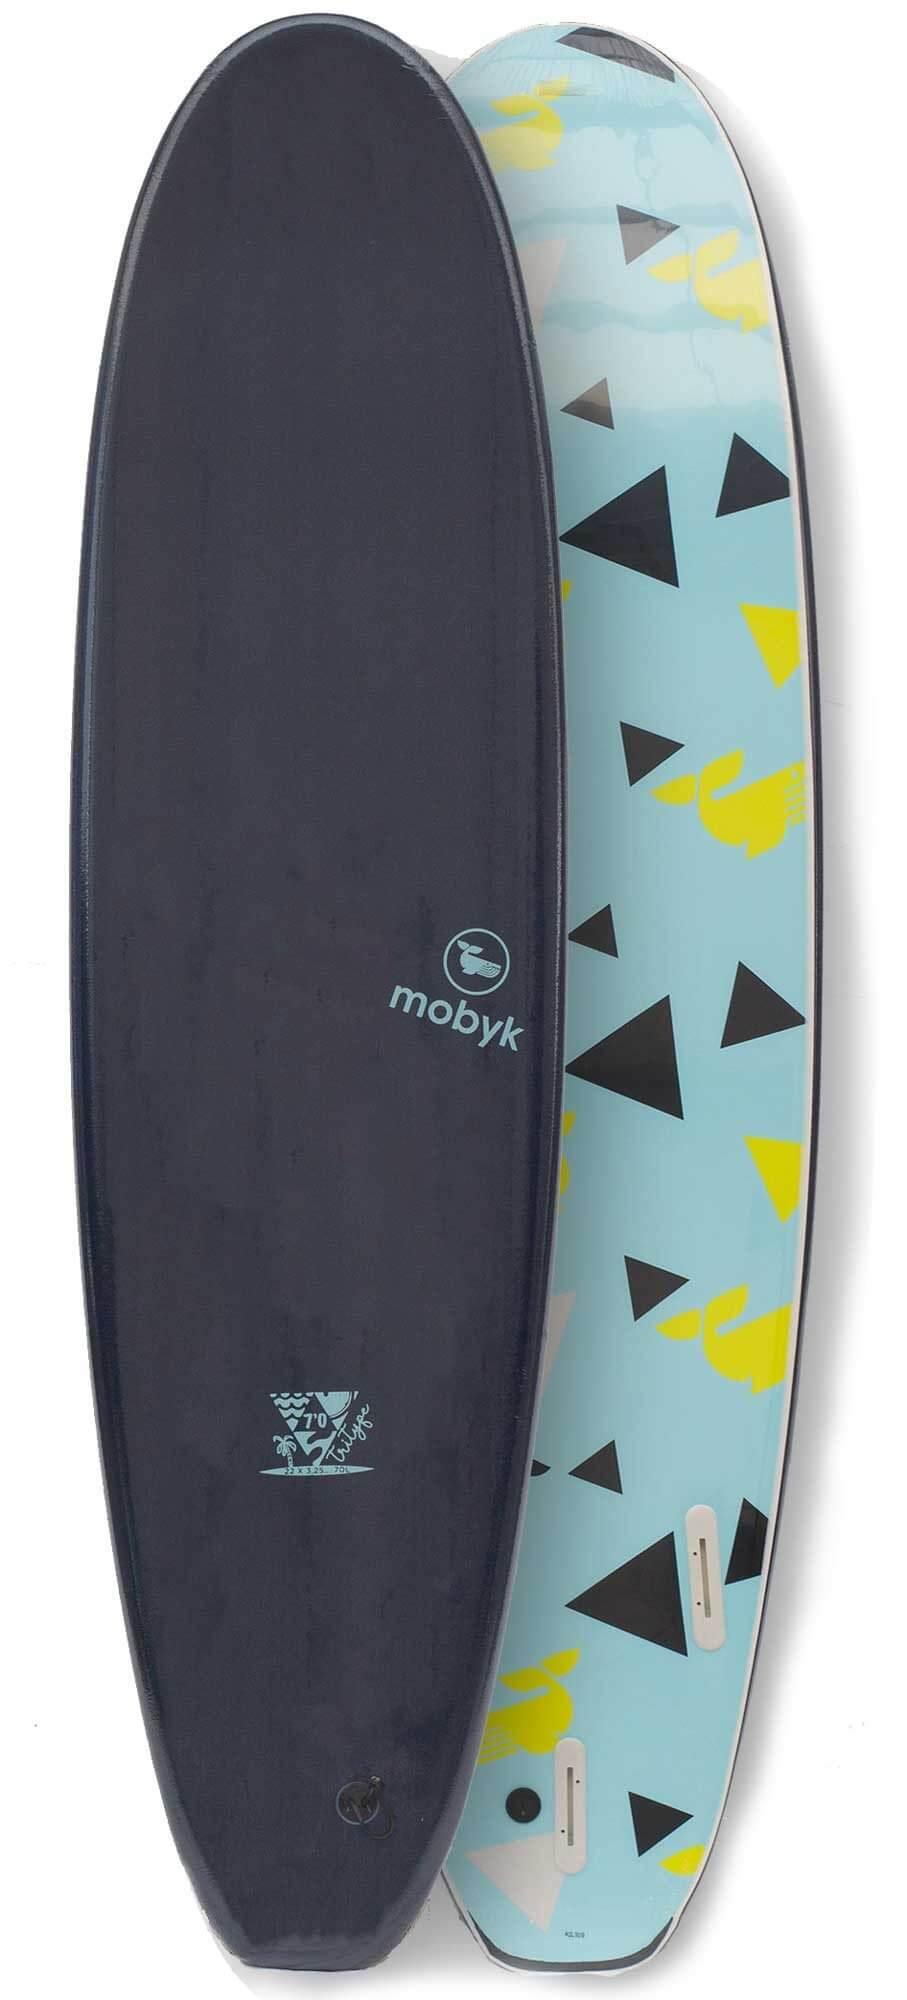 tabla-de-surf-softboard-mobyk-classic-long